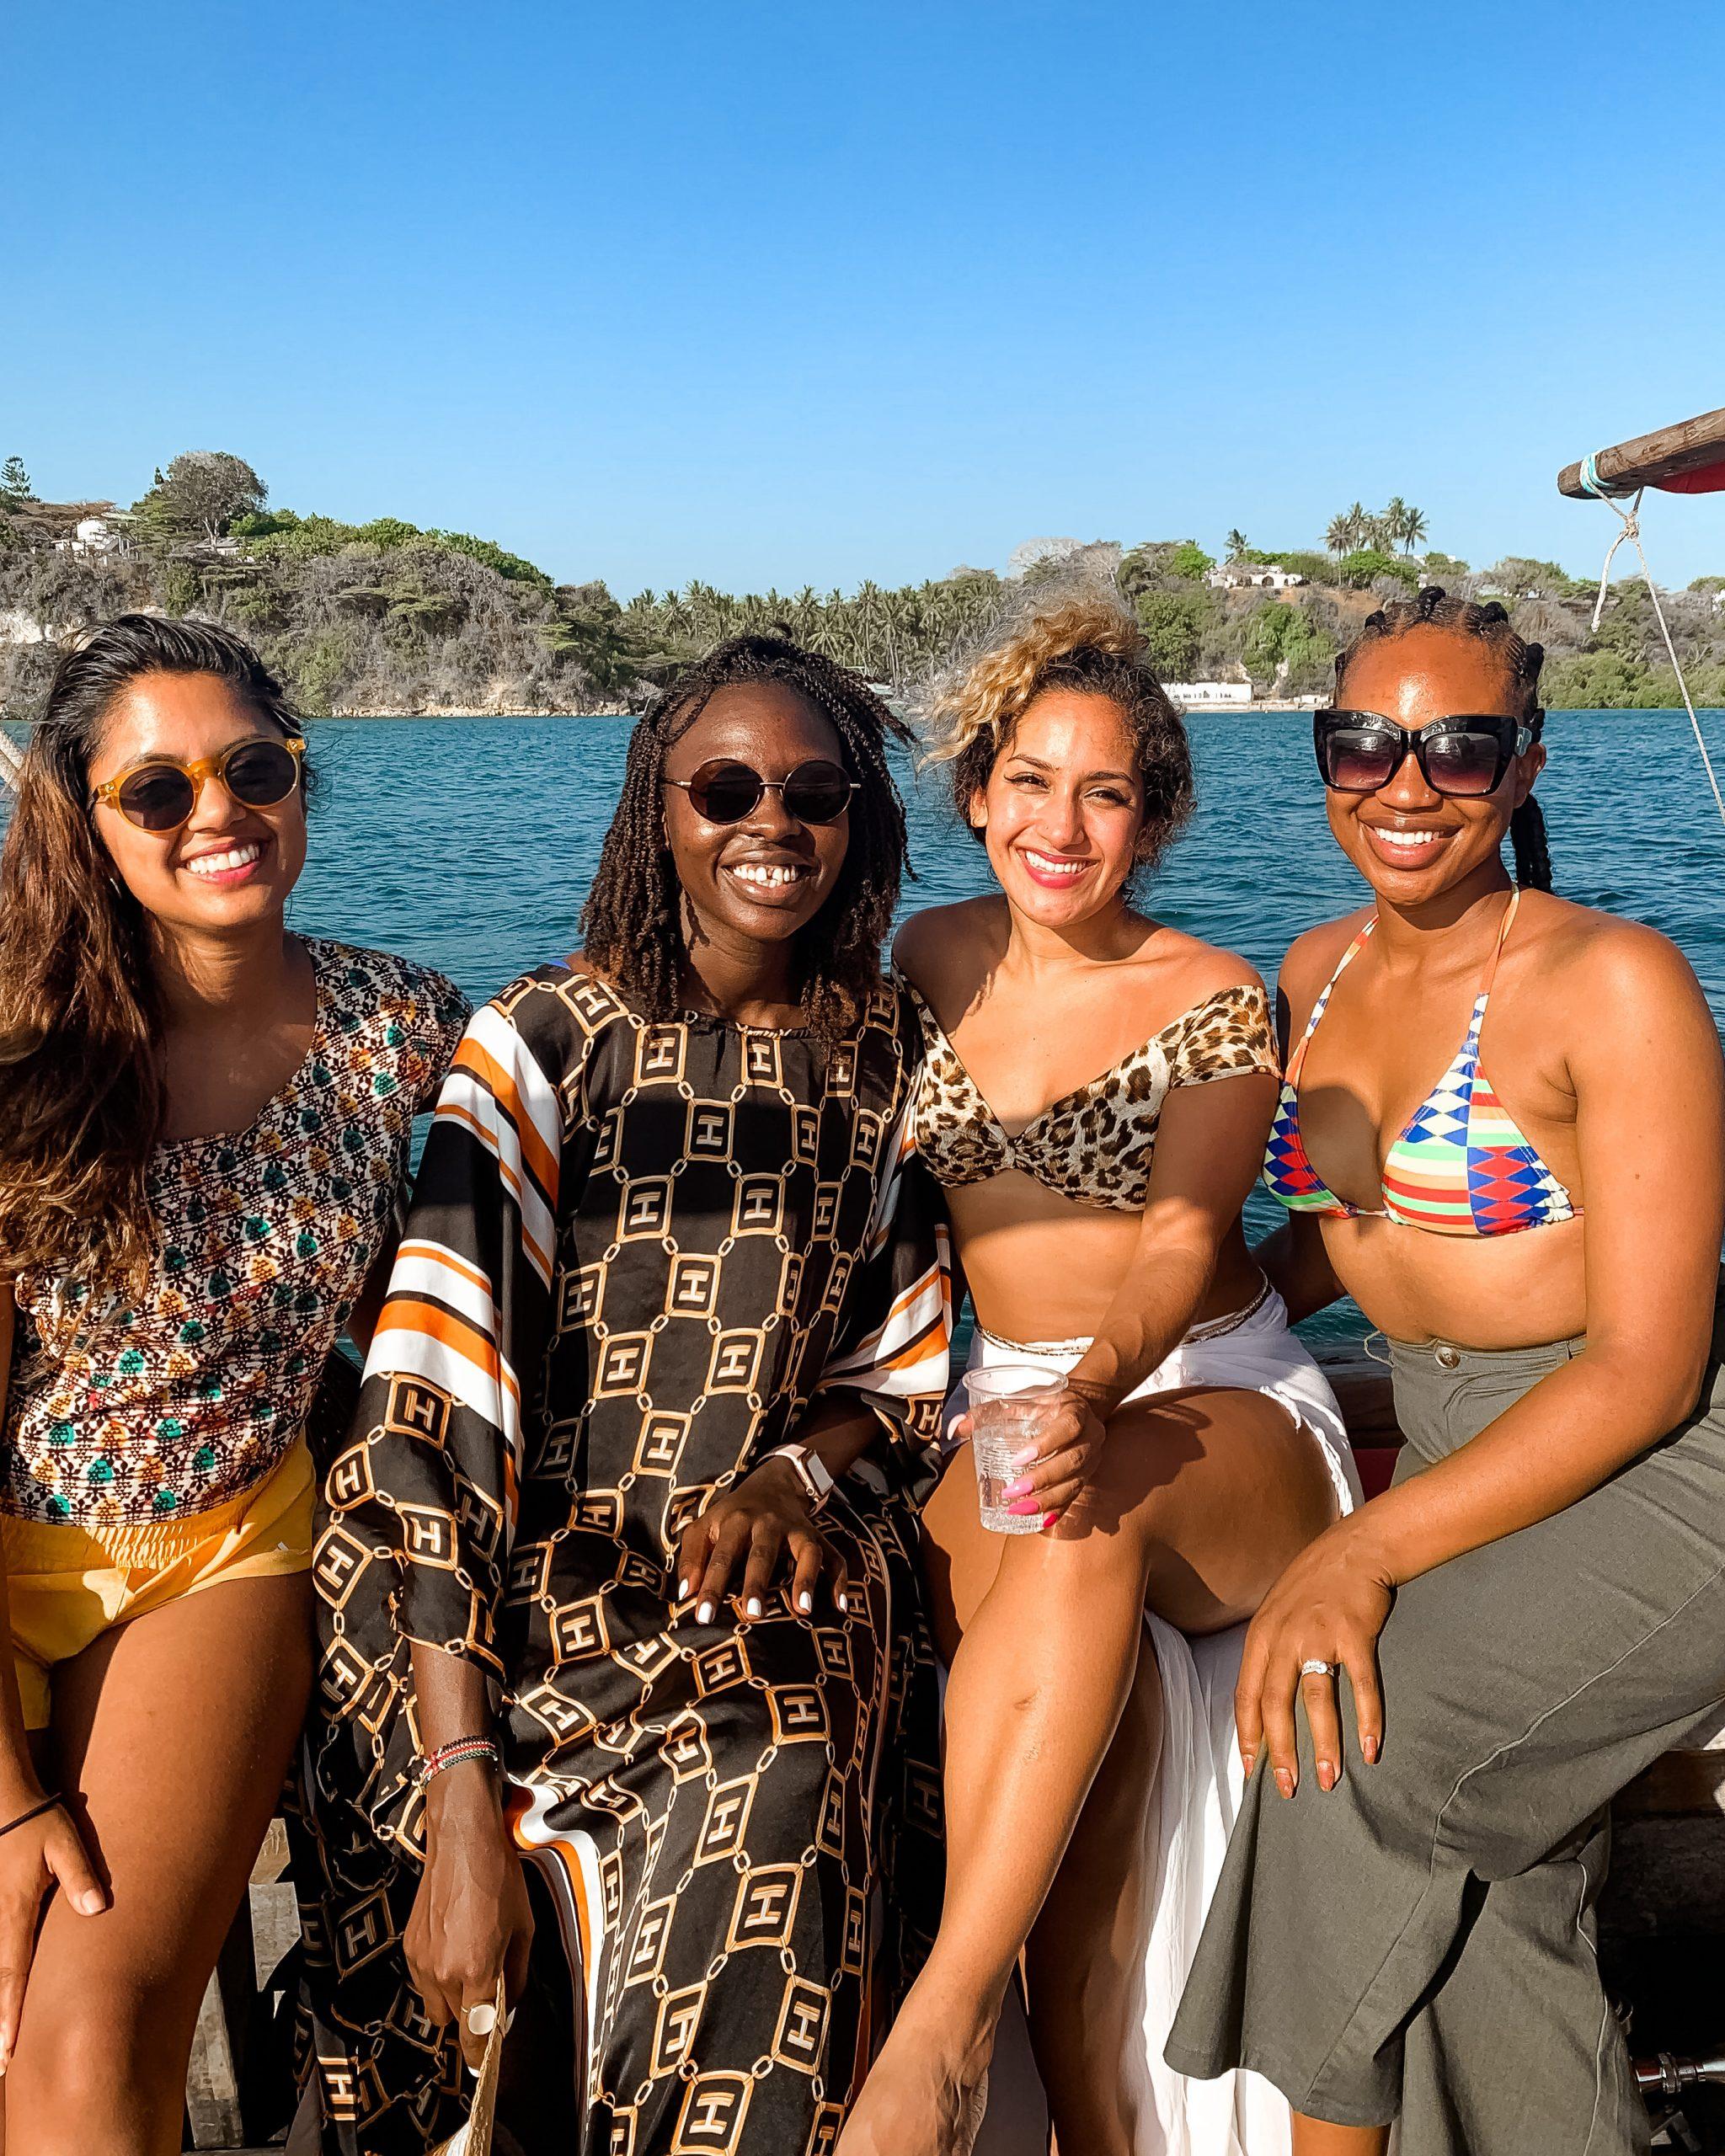 Ijeoma Kola and friends on girls trip in Kenya